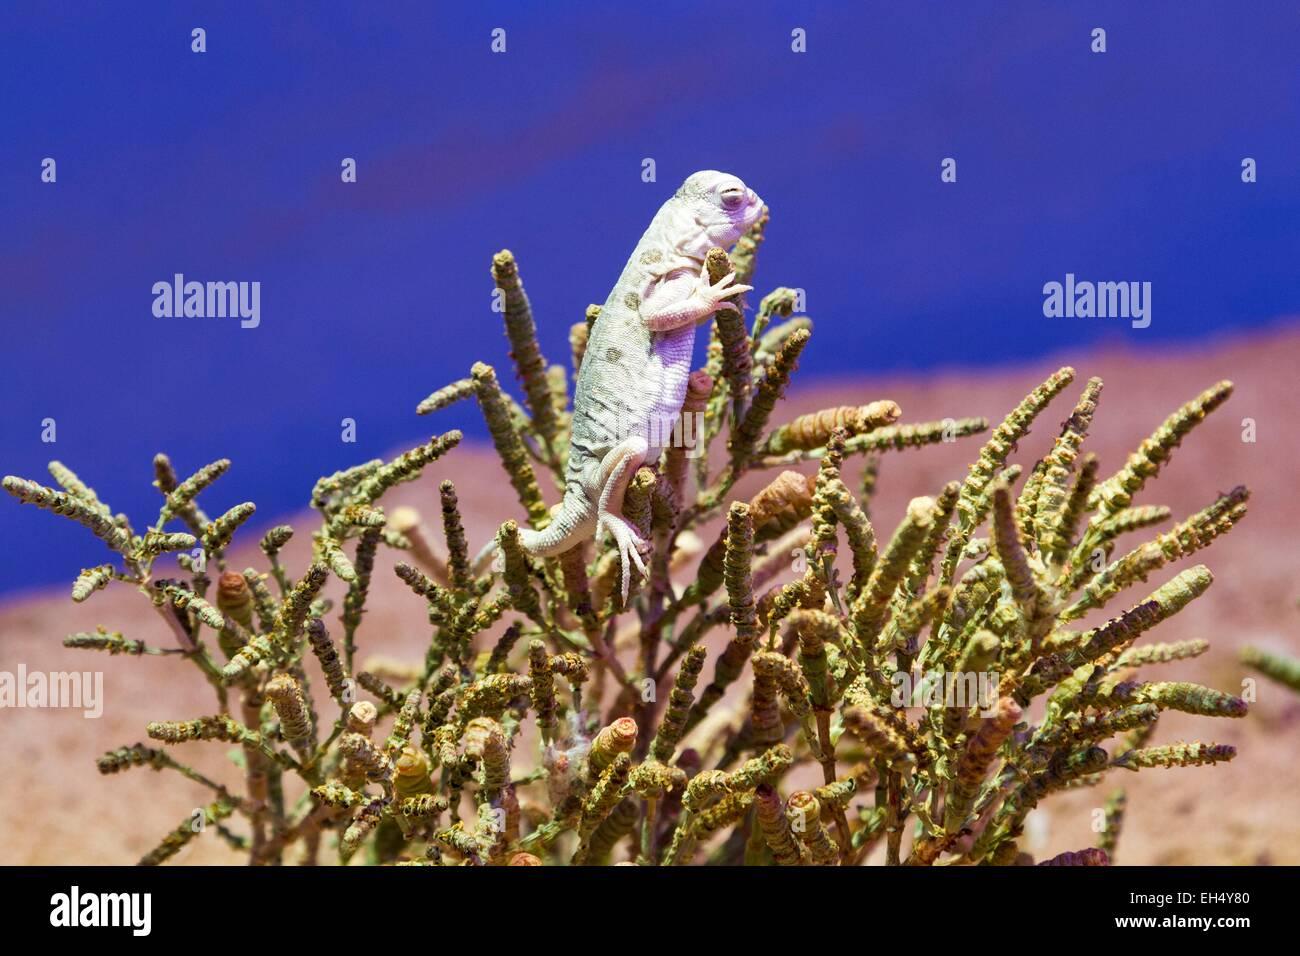 Australia, Northern Territory, Alice Springs, Alice Spring Desert Park, Lake Eyre Dragon (Ctenophorus maculosus) - Stock Image